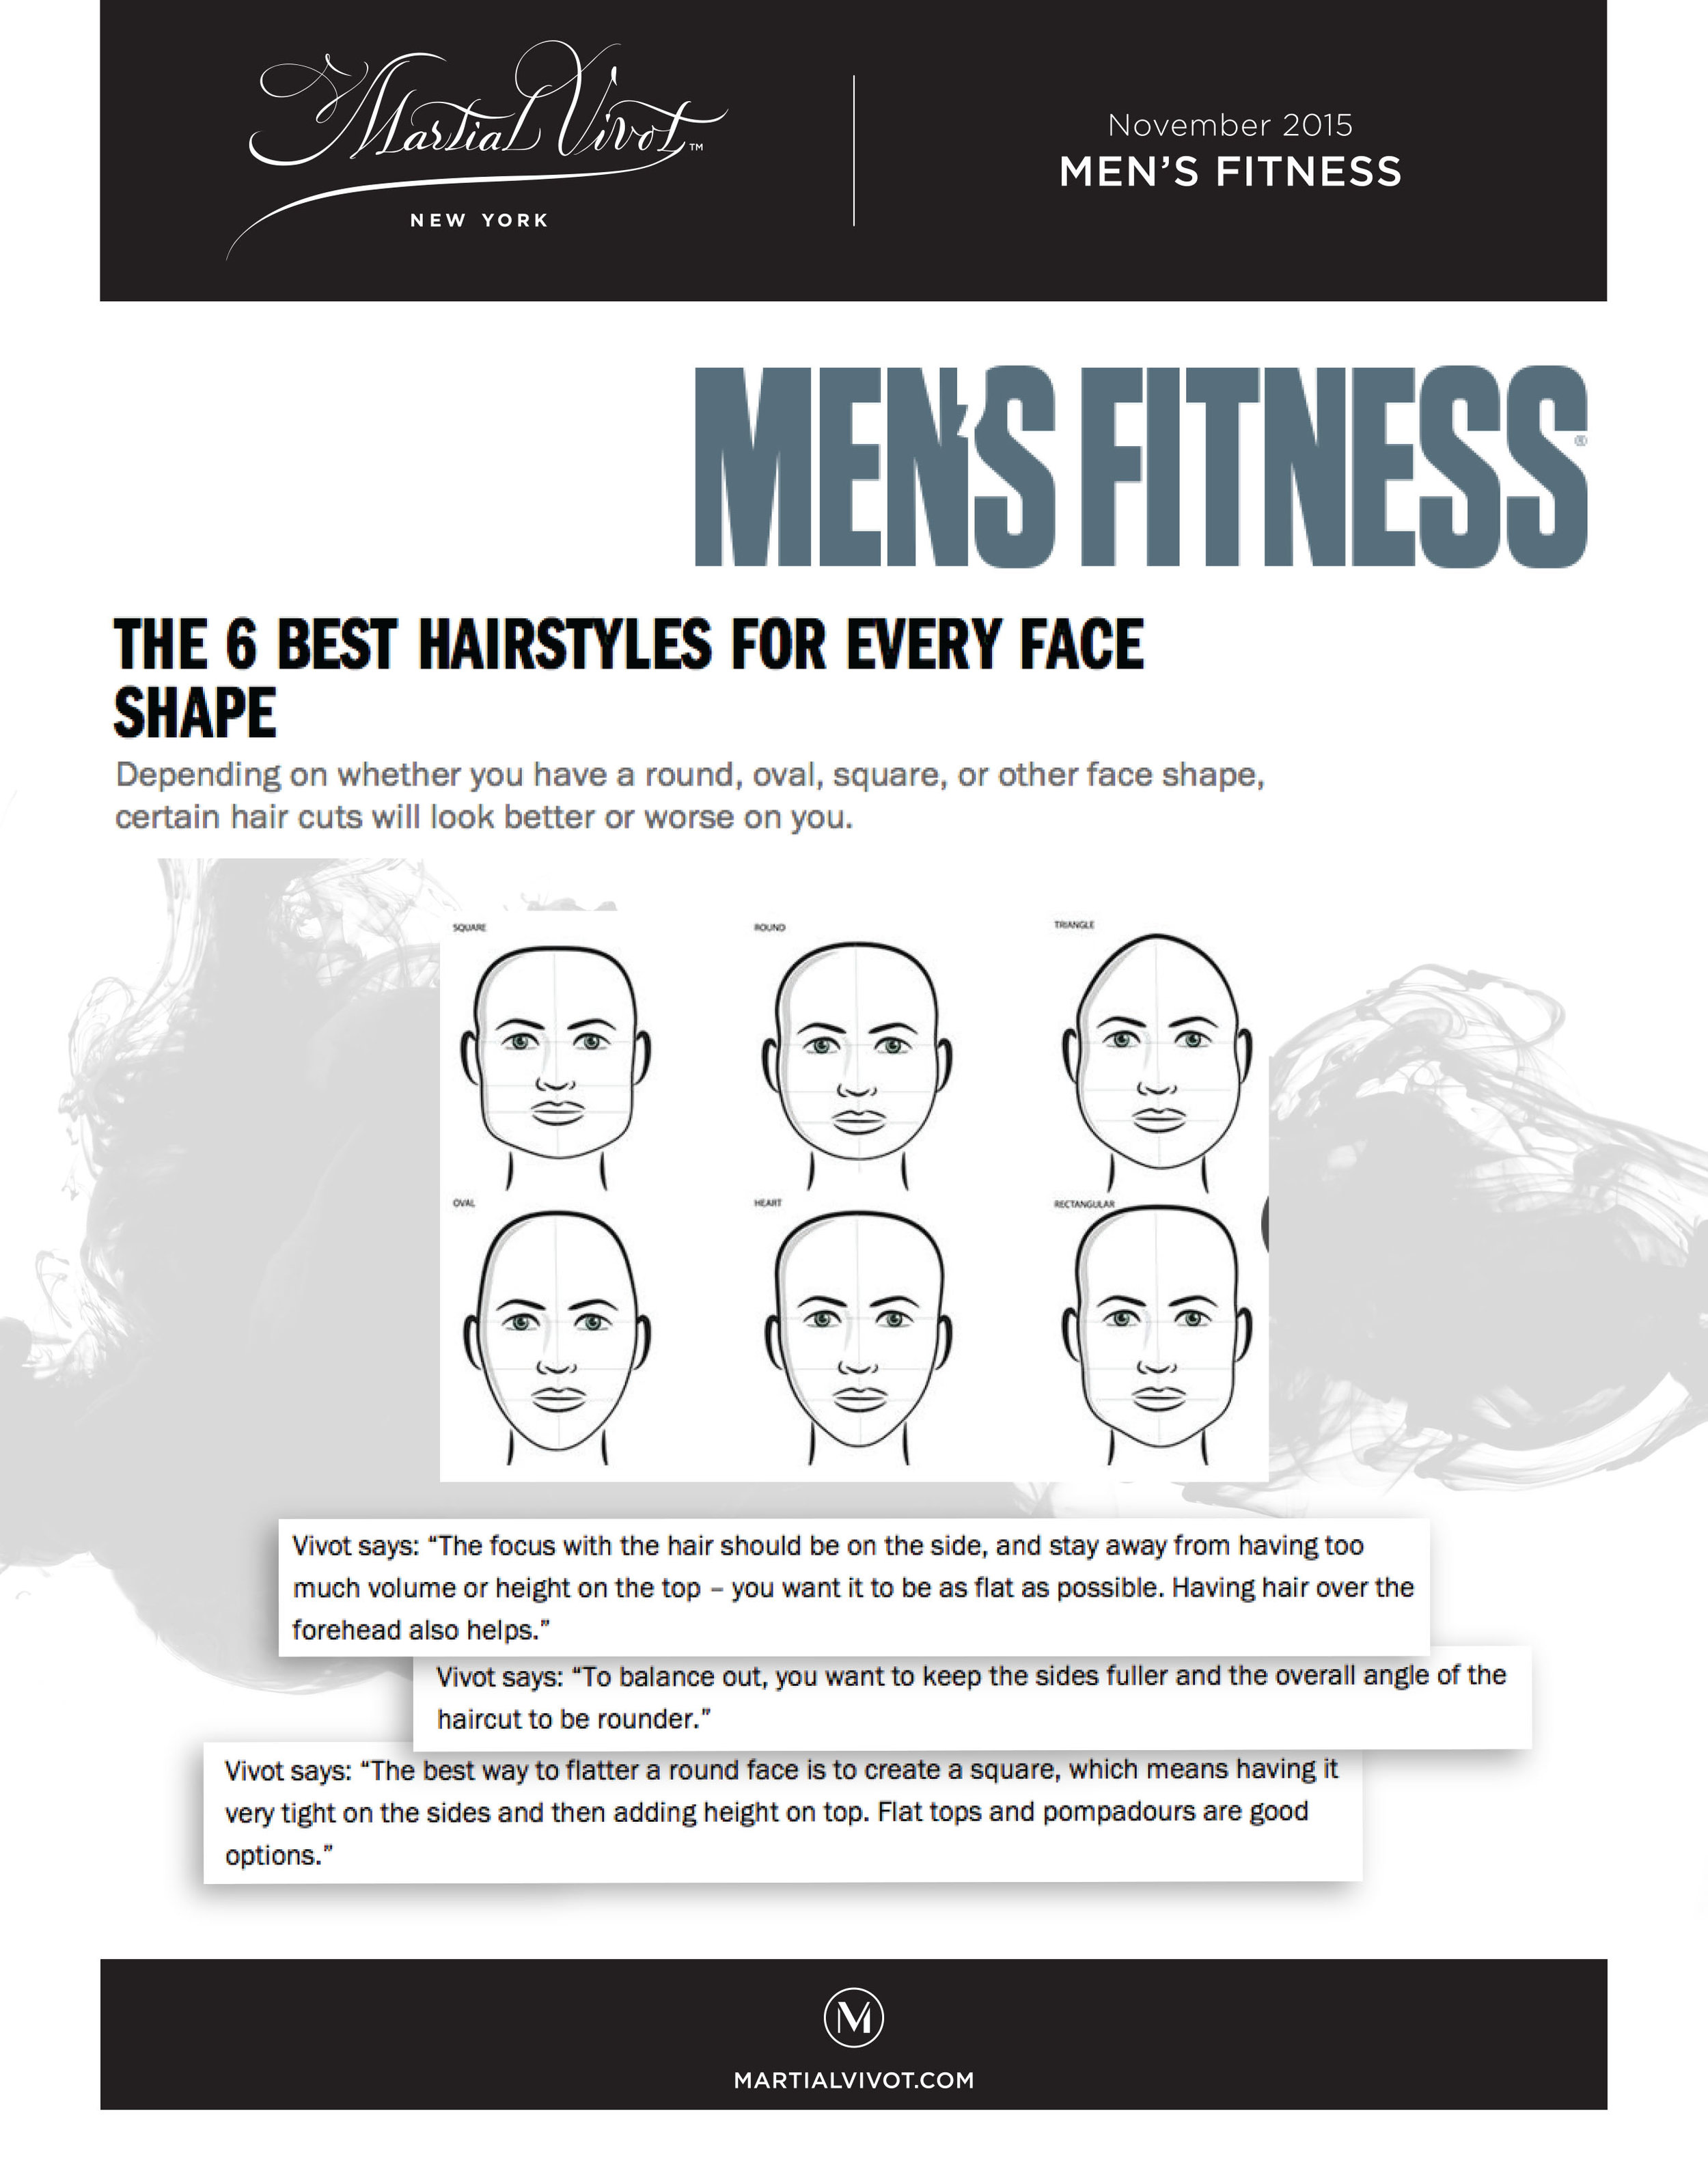 MensFitness Nov15.jpg